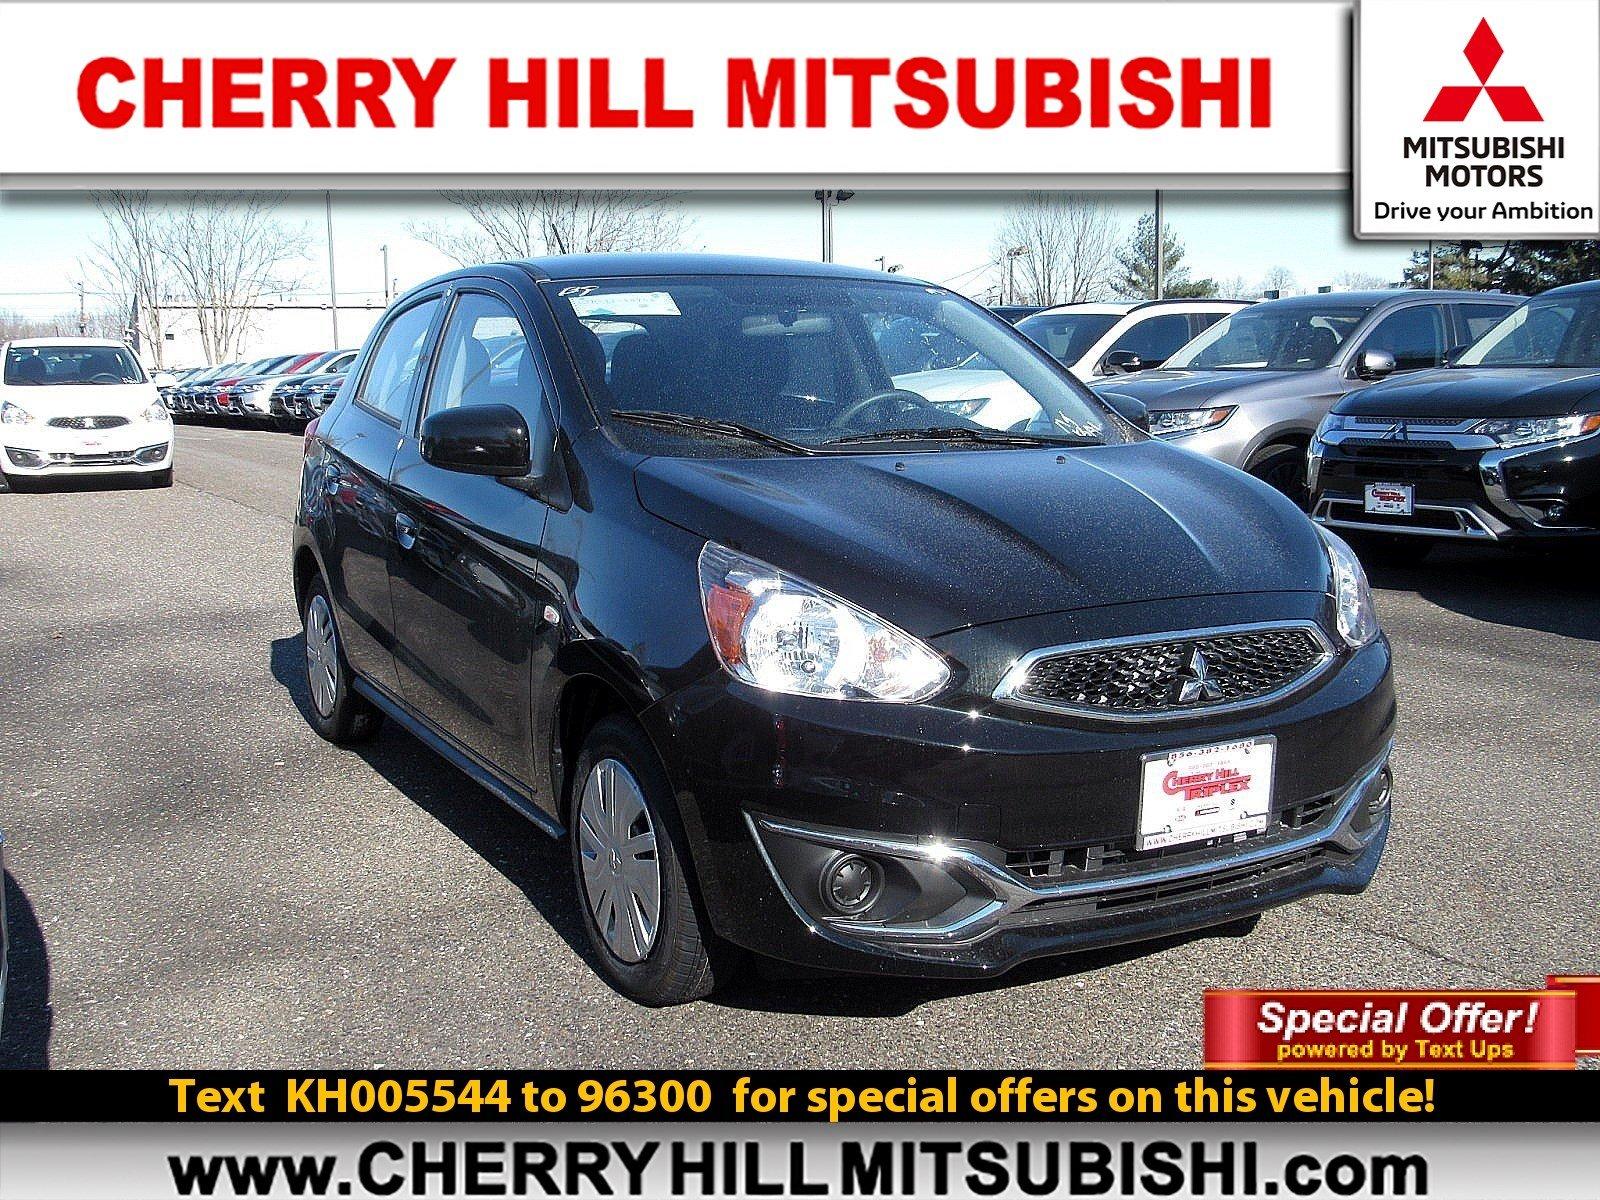 New Cars For Sale Near Philadelphia New Car Dealership Cherry Hill